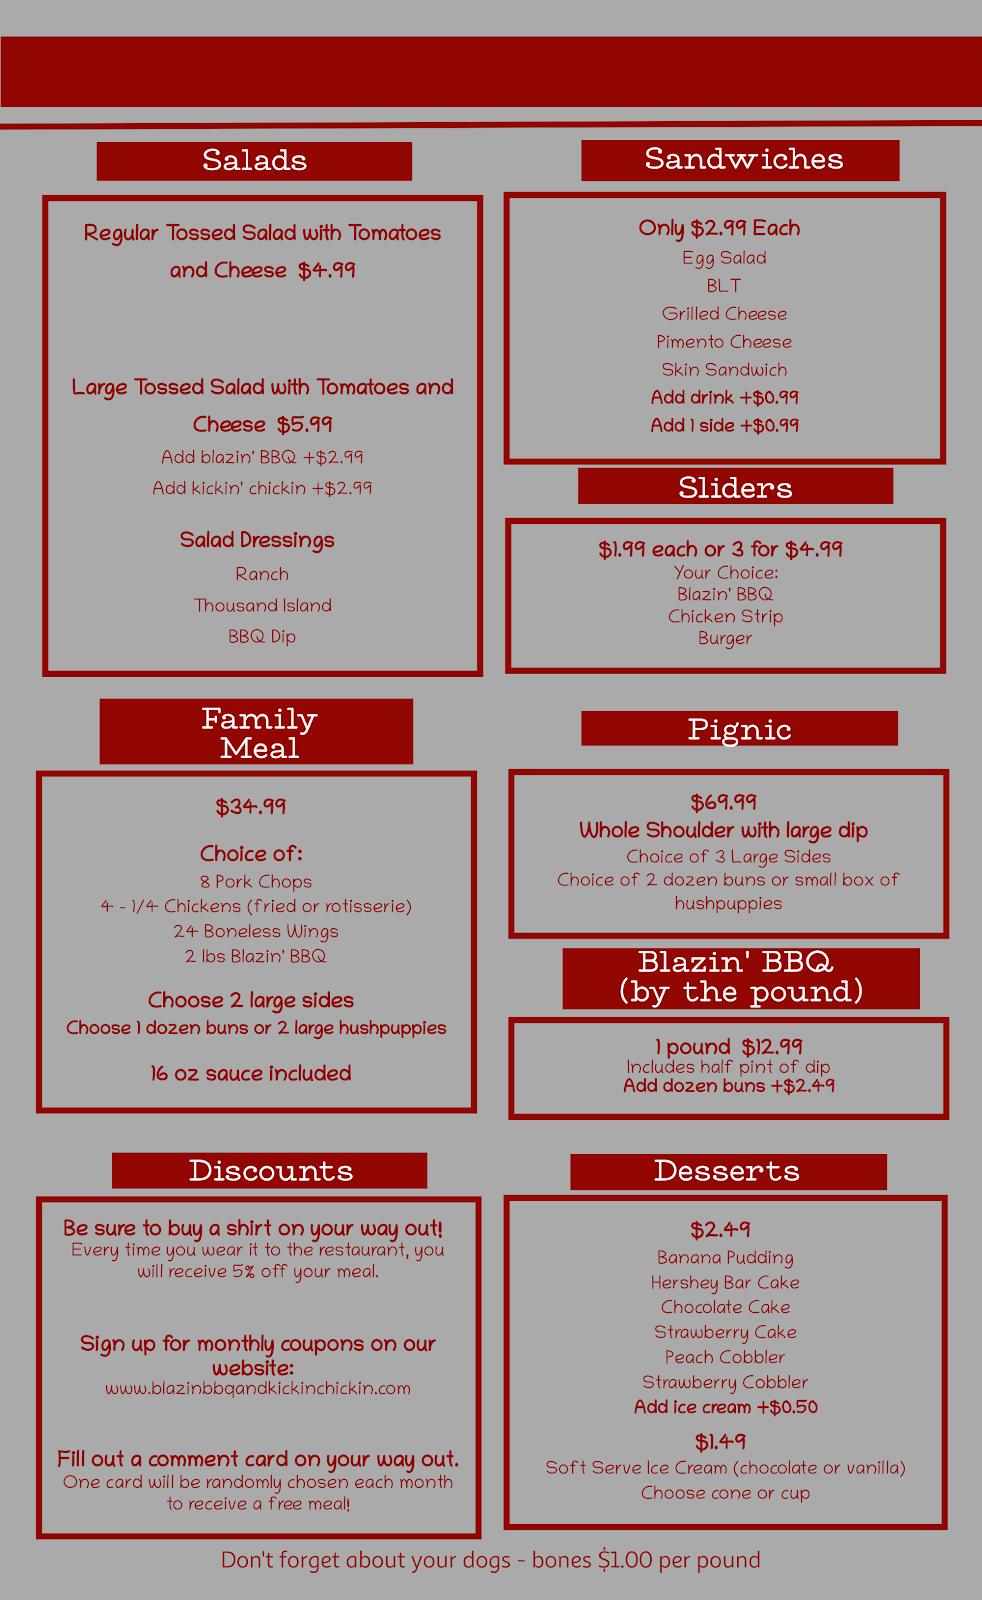 Blazin BBQ and Kickin Chickin | restaurant | 295 N Talbert Blvd, Lexington, NC 27292, USA | 3368434820 OR +1 336-843-4820